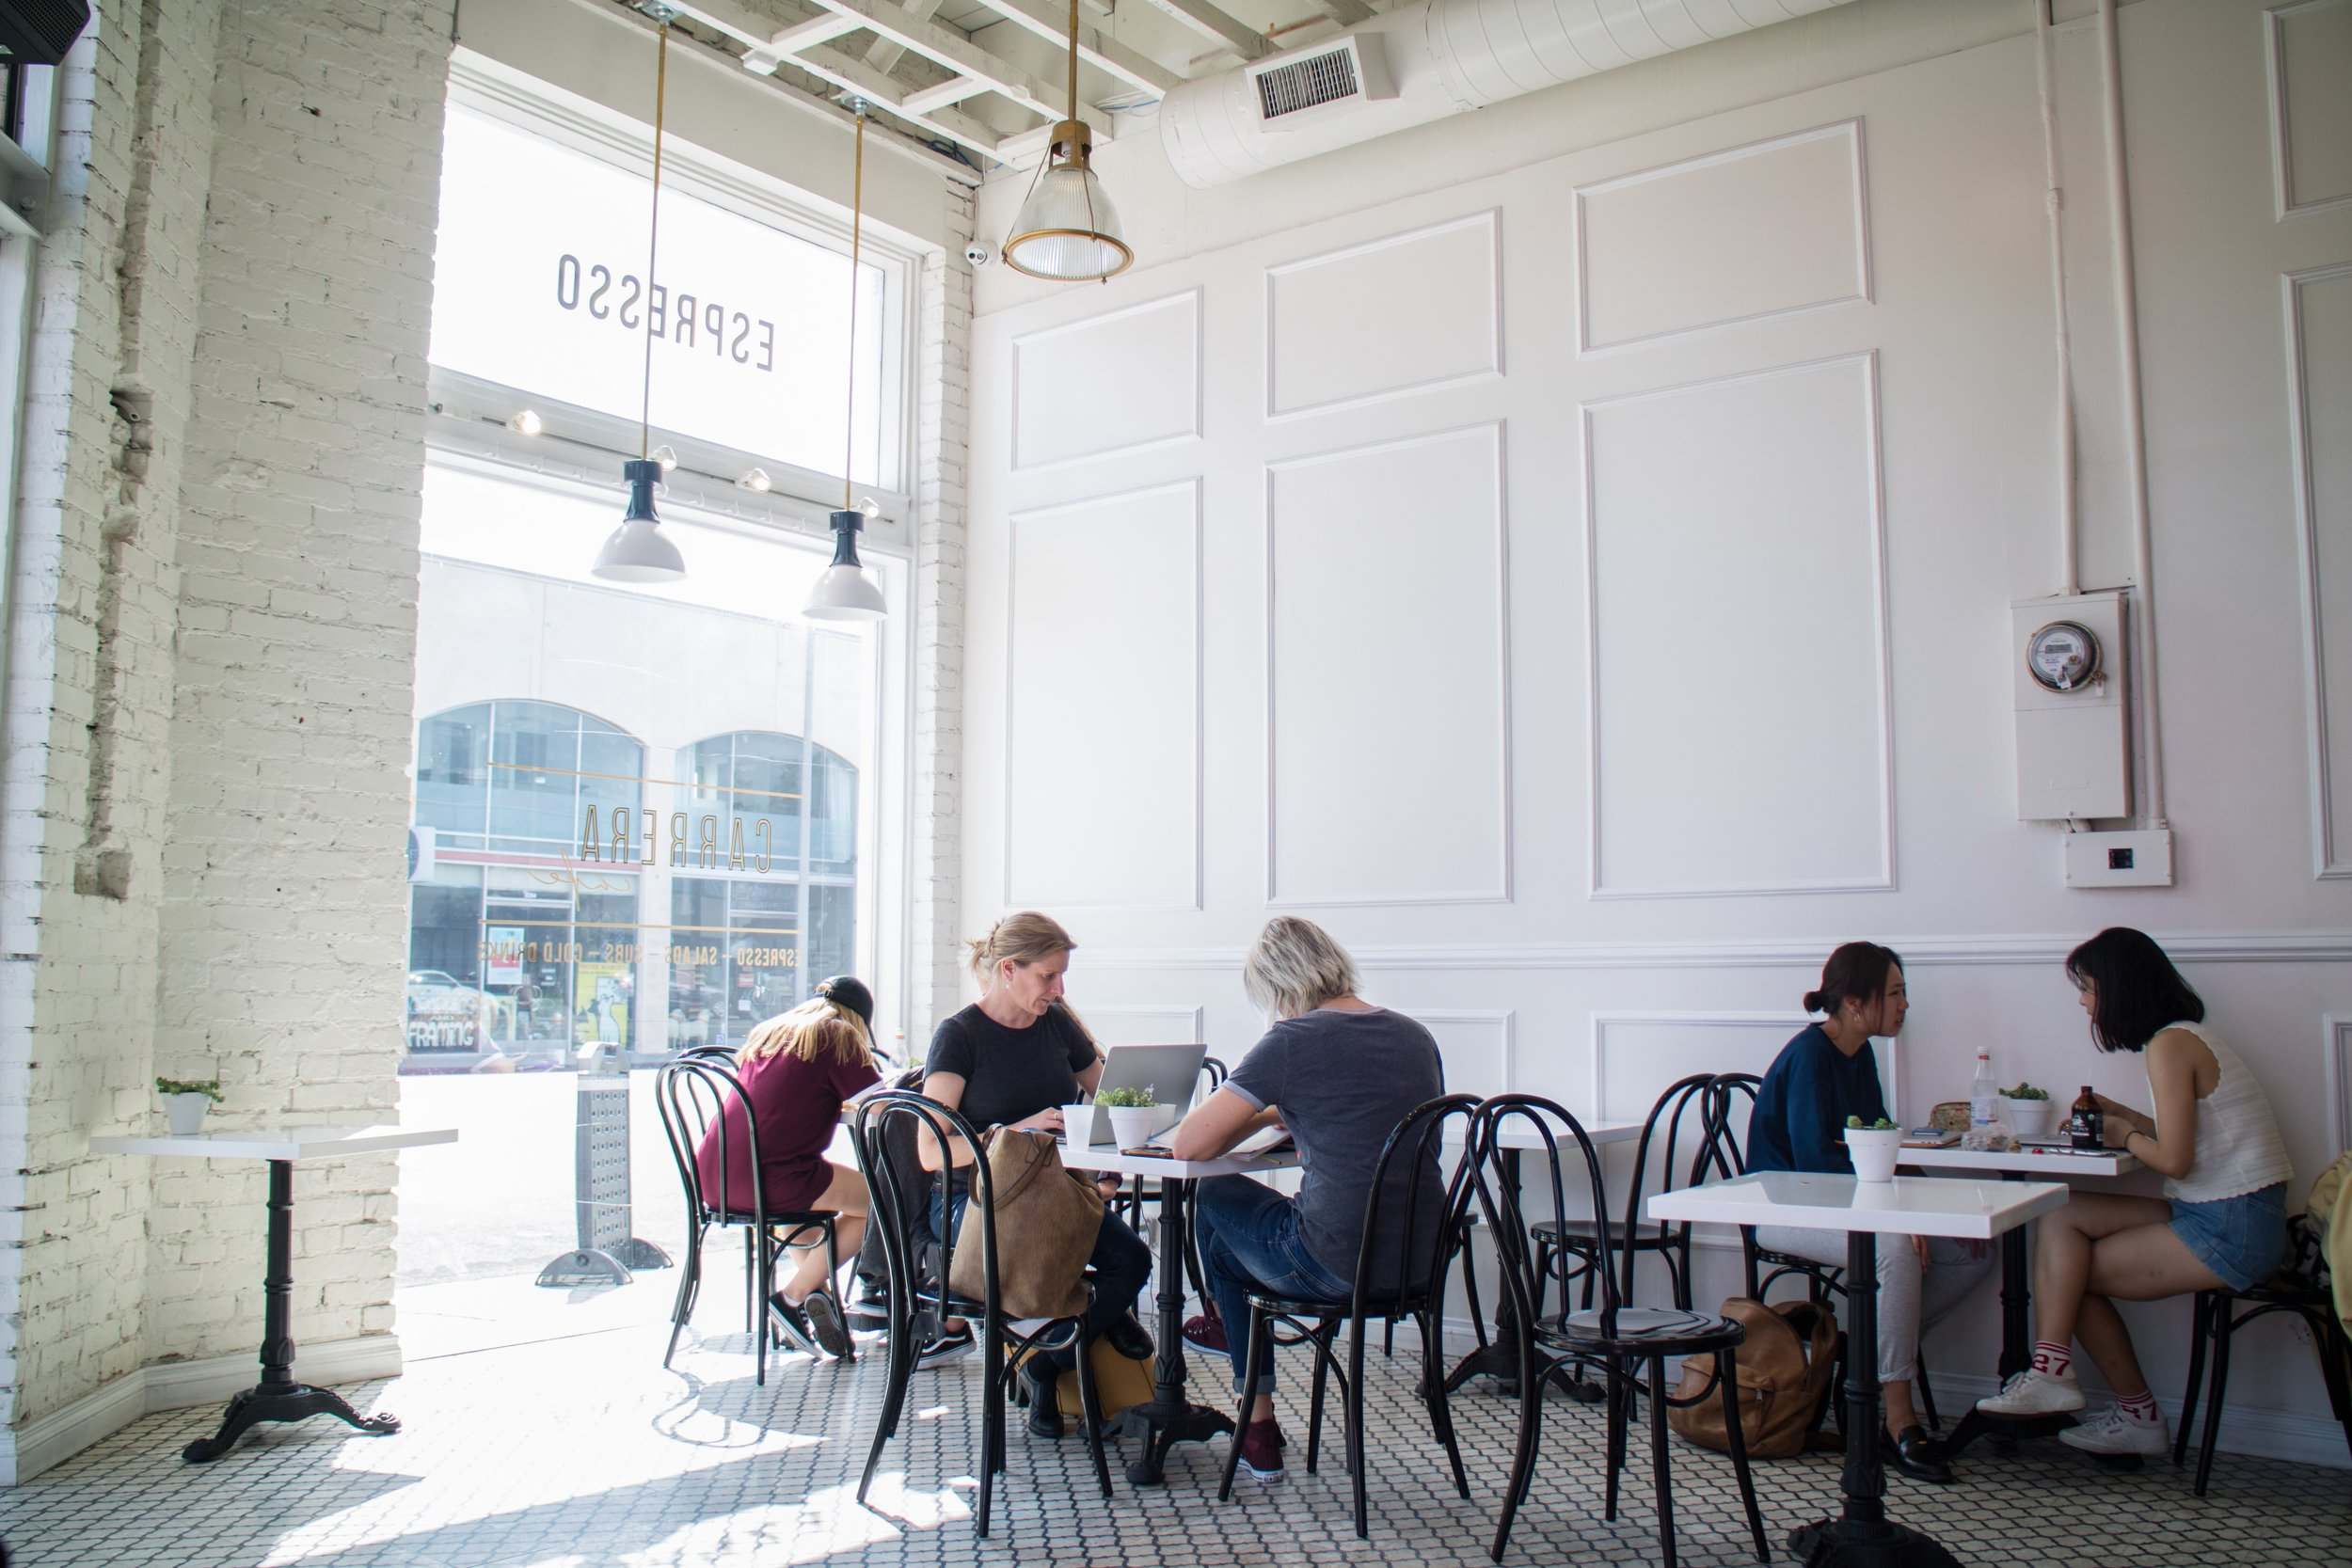 Carrera Cafe - People Watching